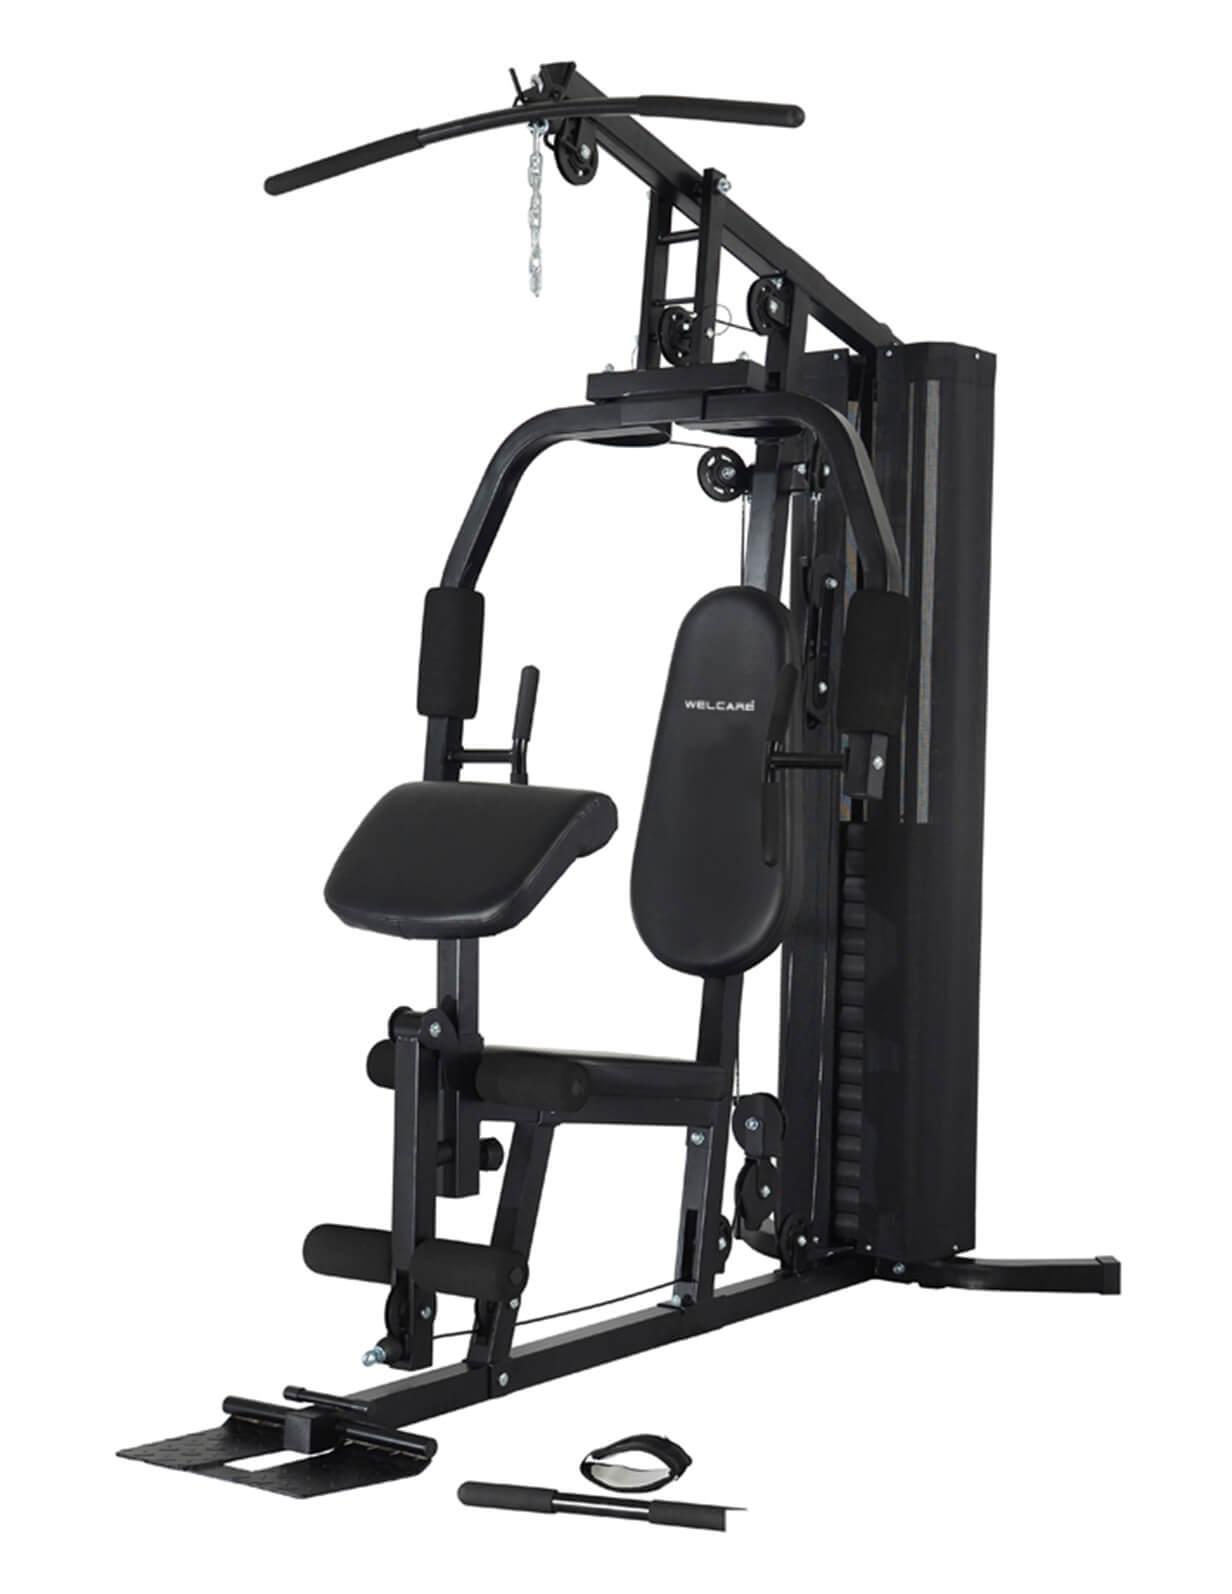 WC-4409 Home Gym-70Kg